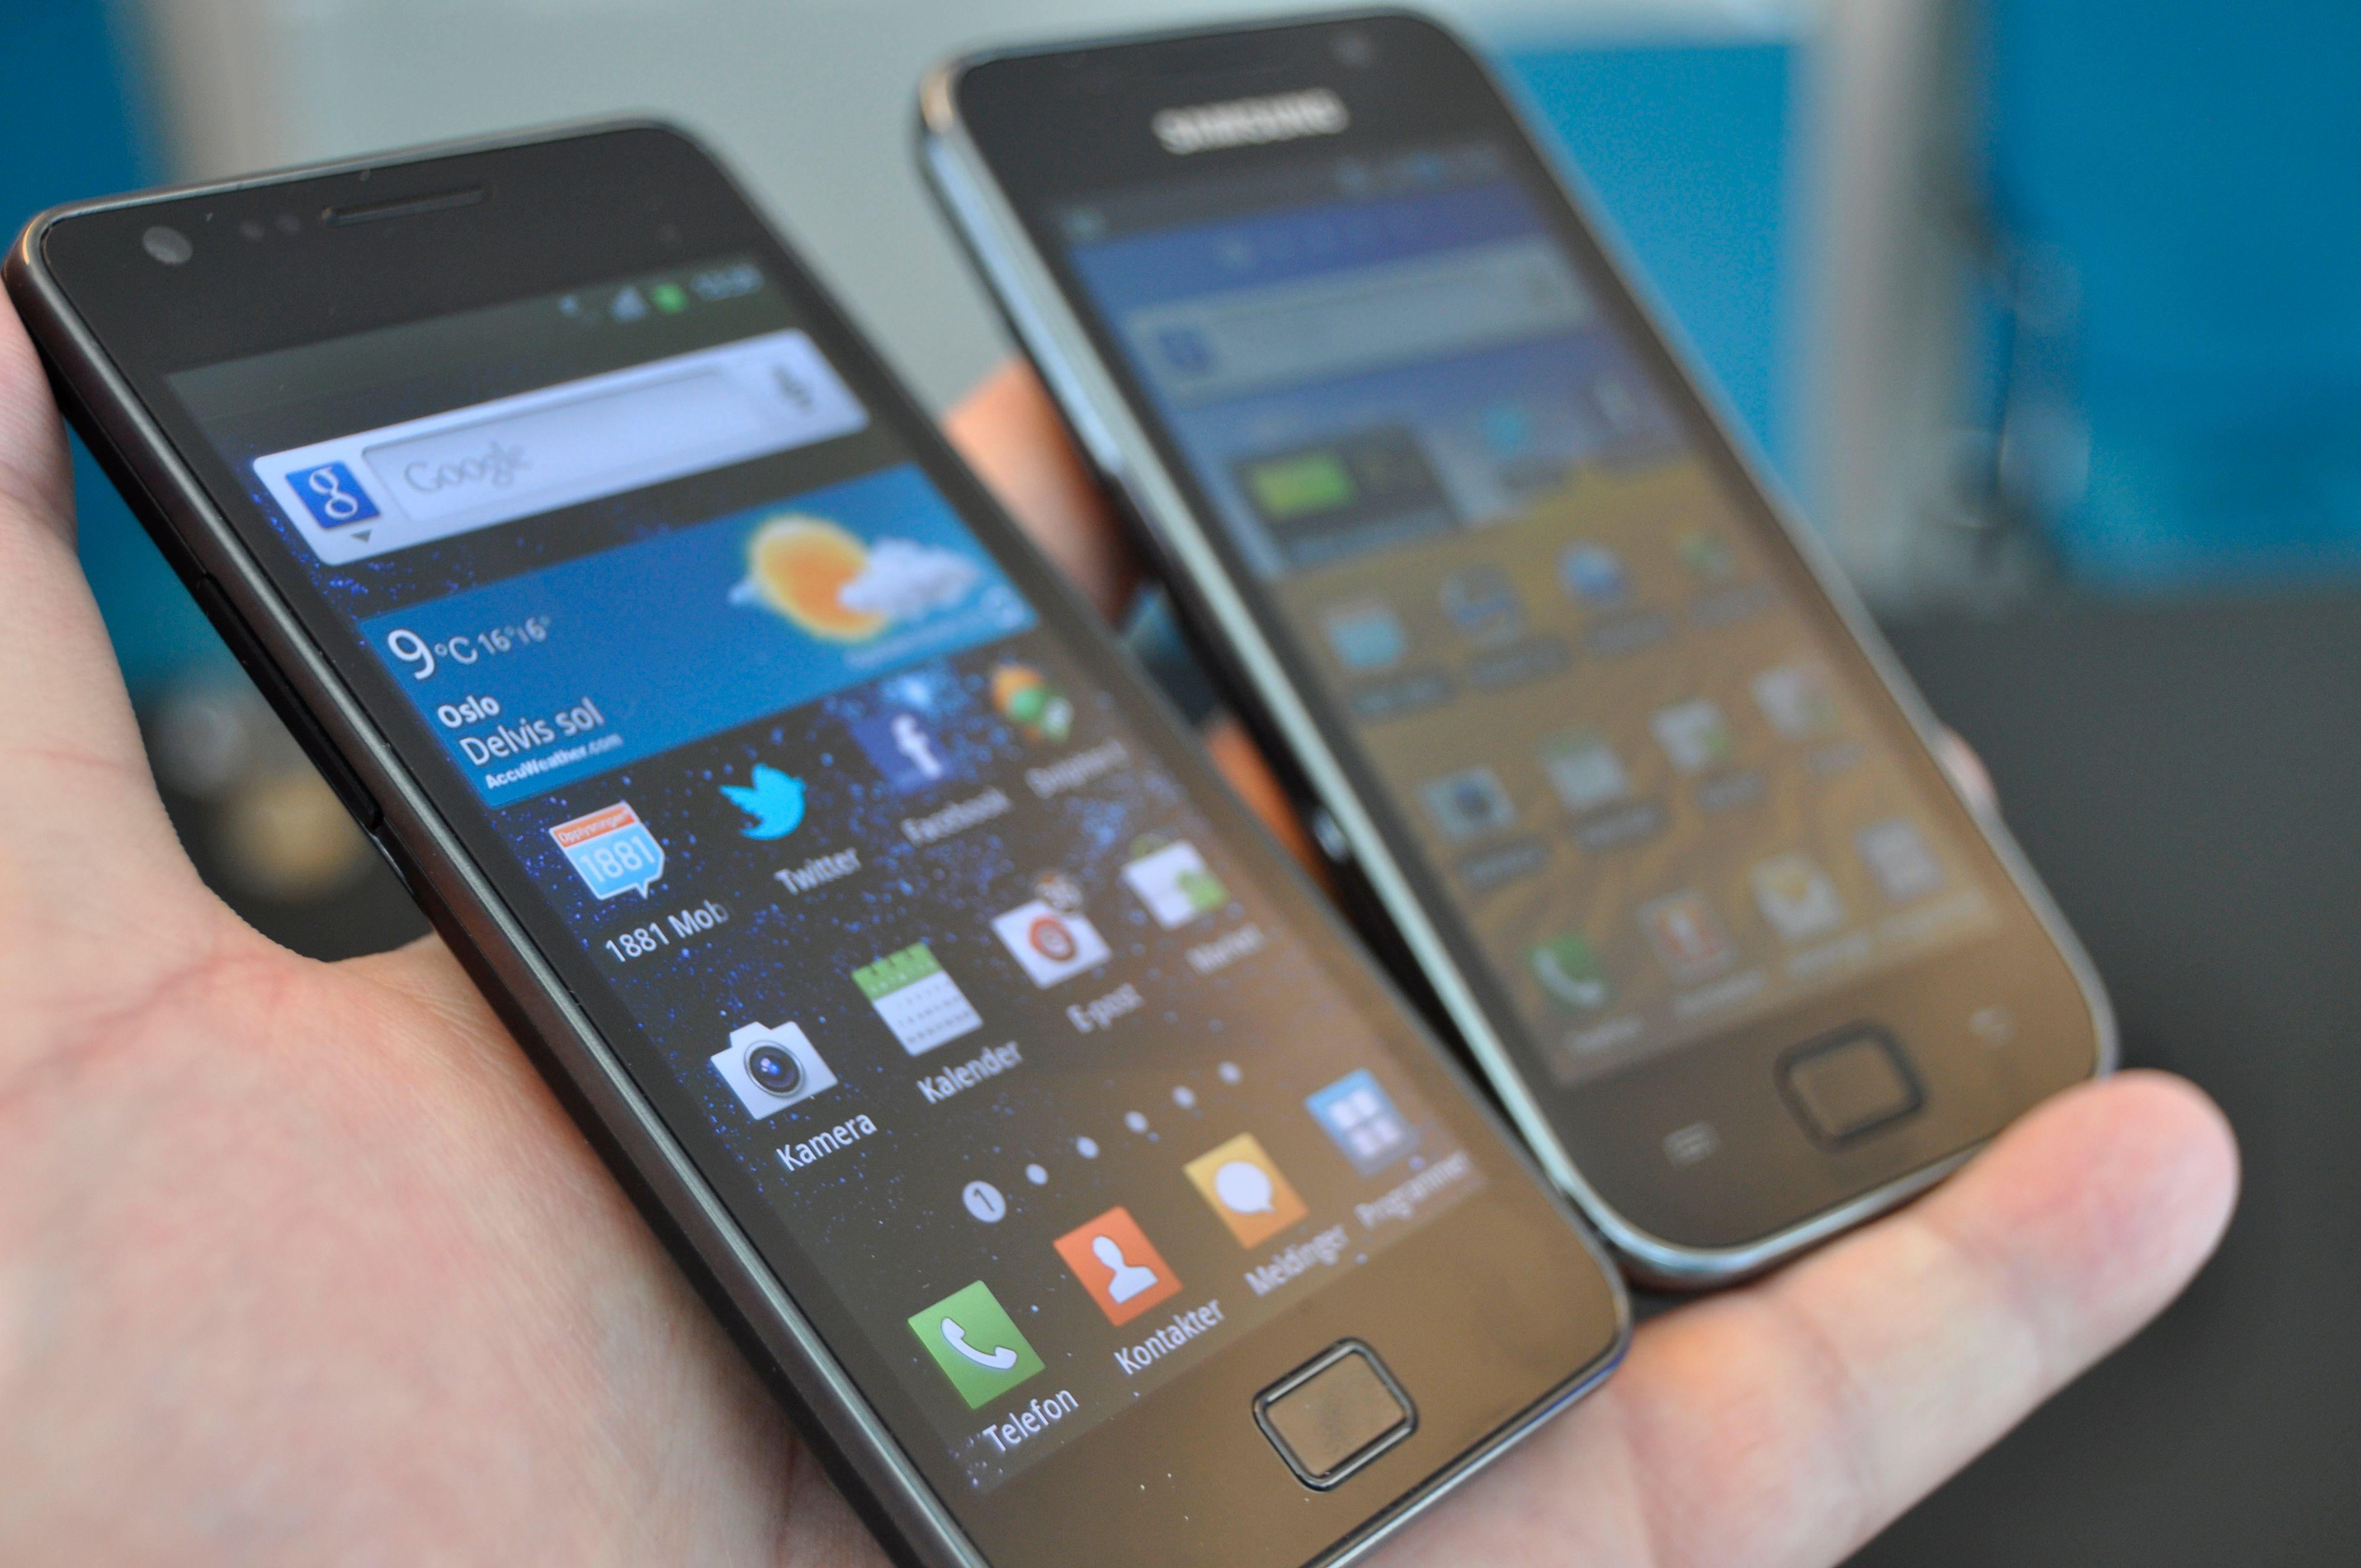 Her er Galaxy S II ved siden av Galaxy S.